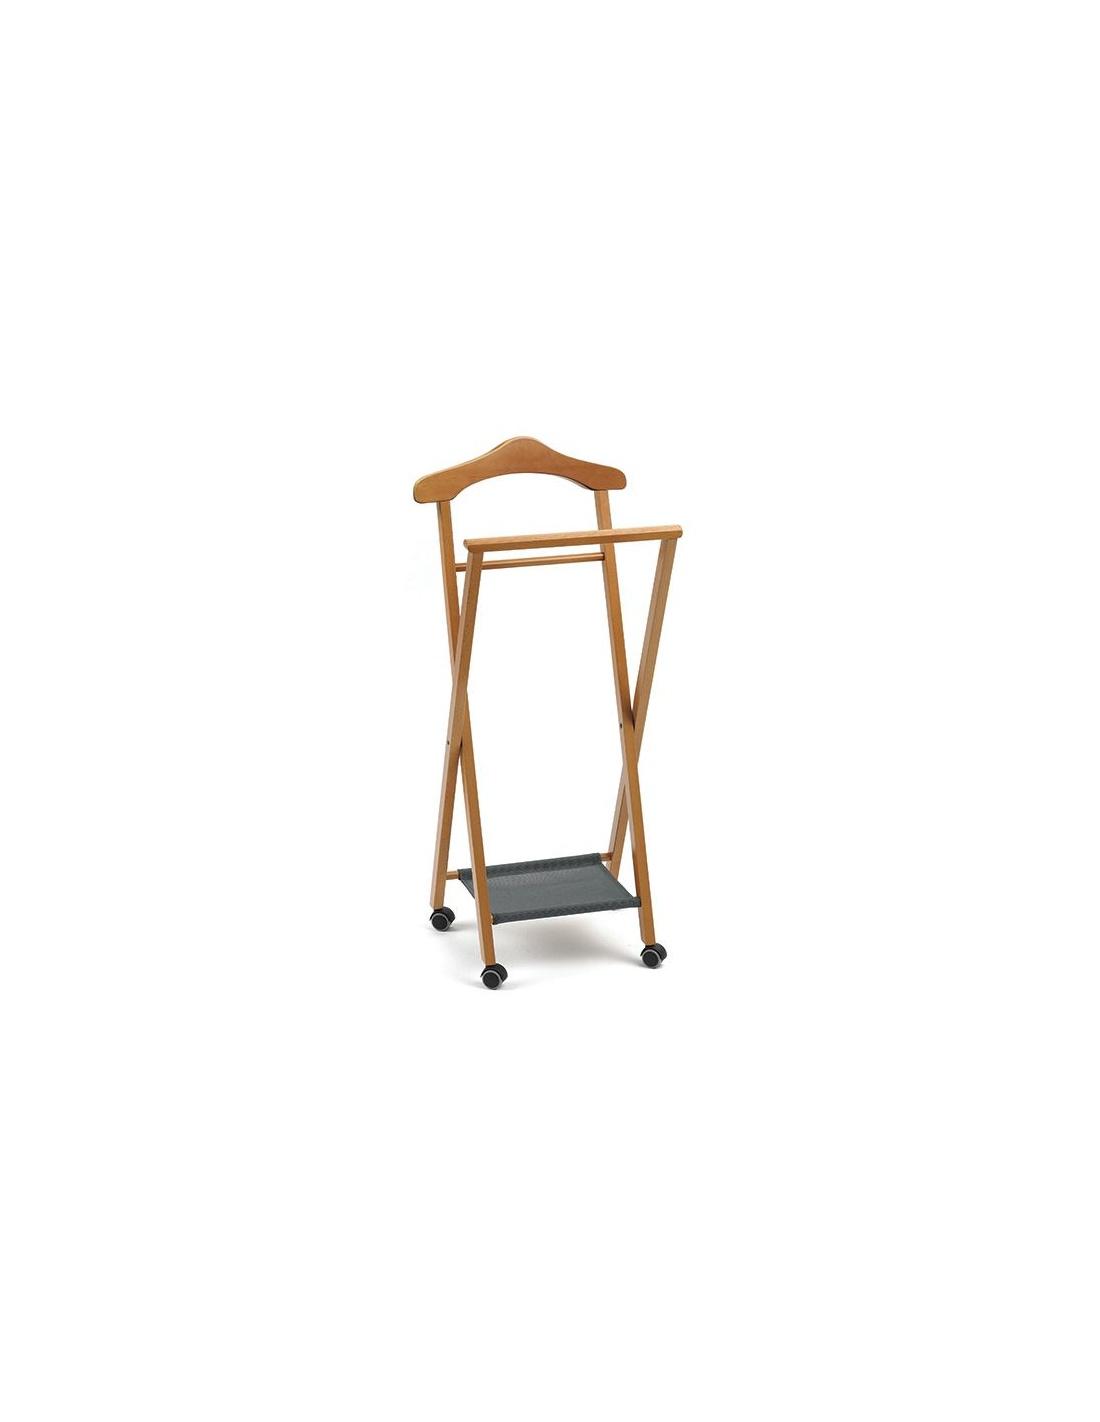 Indossatore in legno da camera mod nelson 119 di arredamenti italia - Portabiti da camera ...